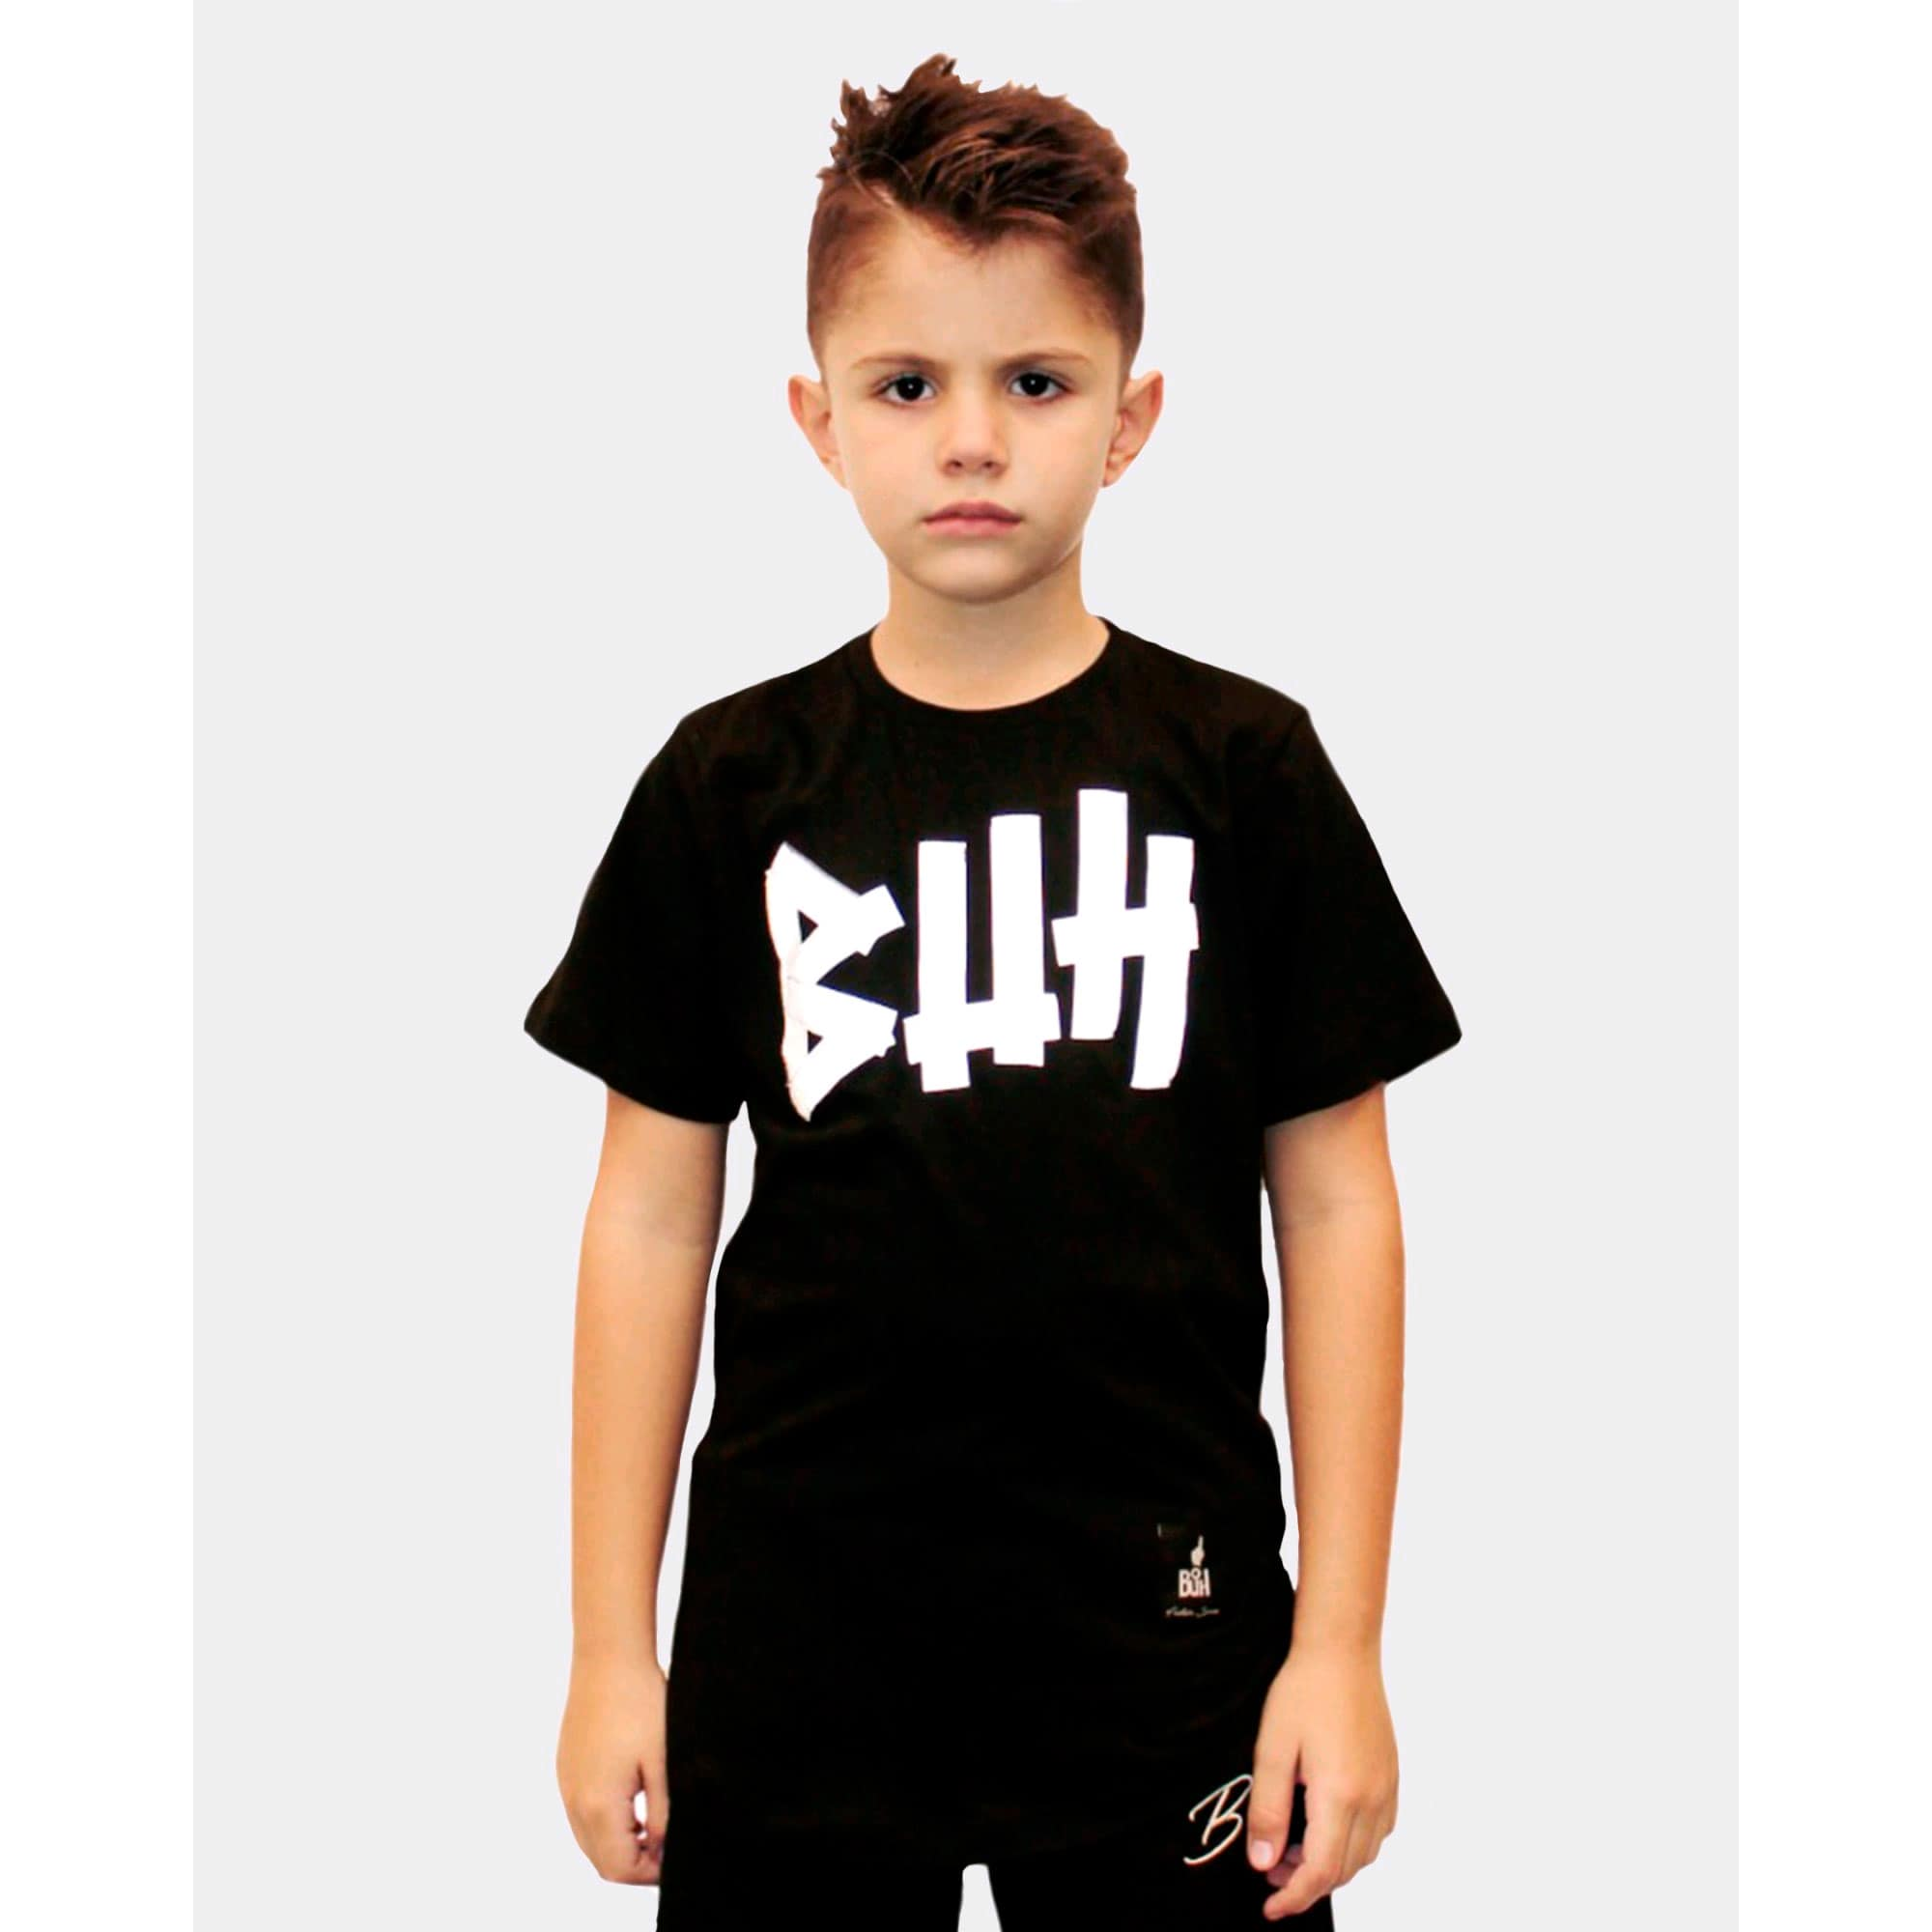 Camiseta Buh Kids Fita Refletiva Black